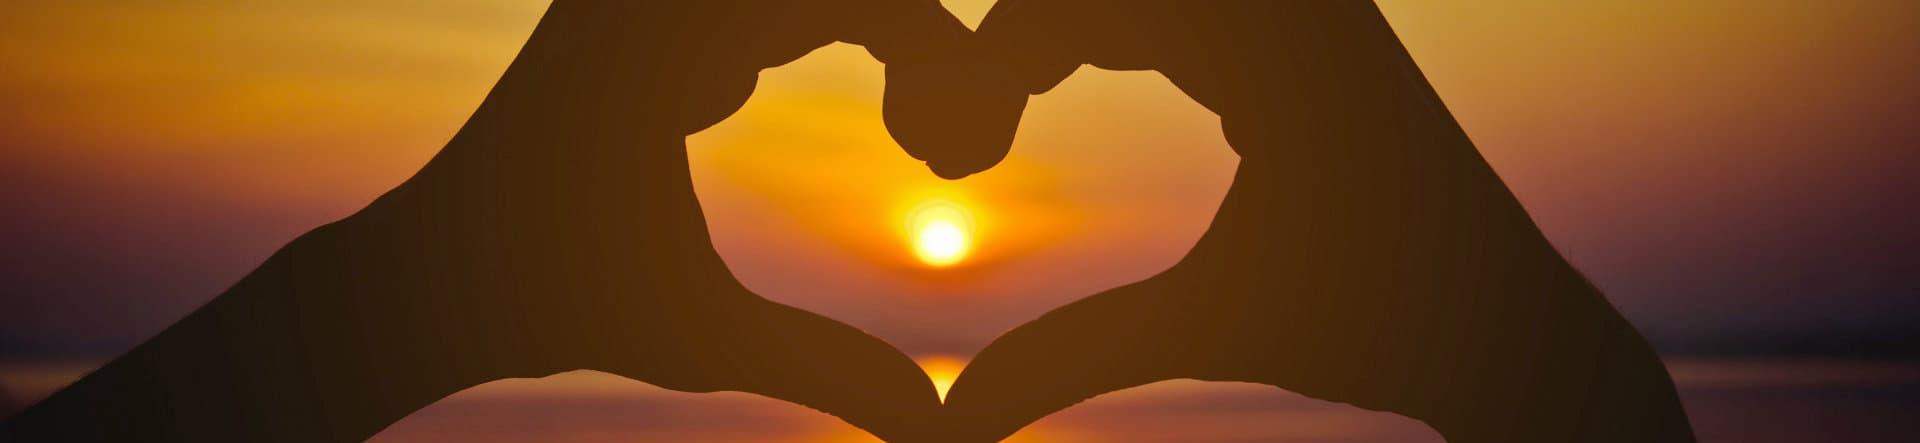 heart on hand over sunset